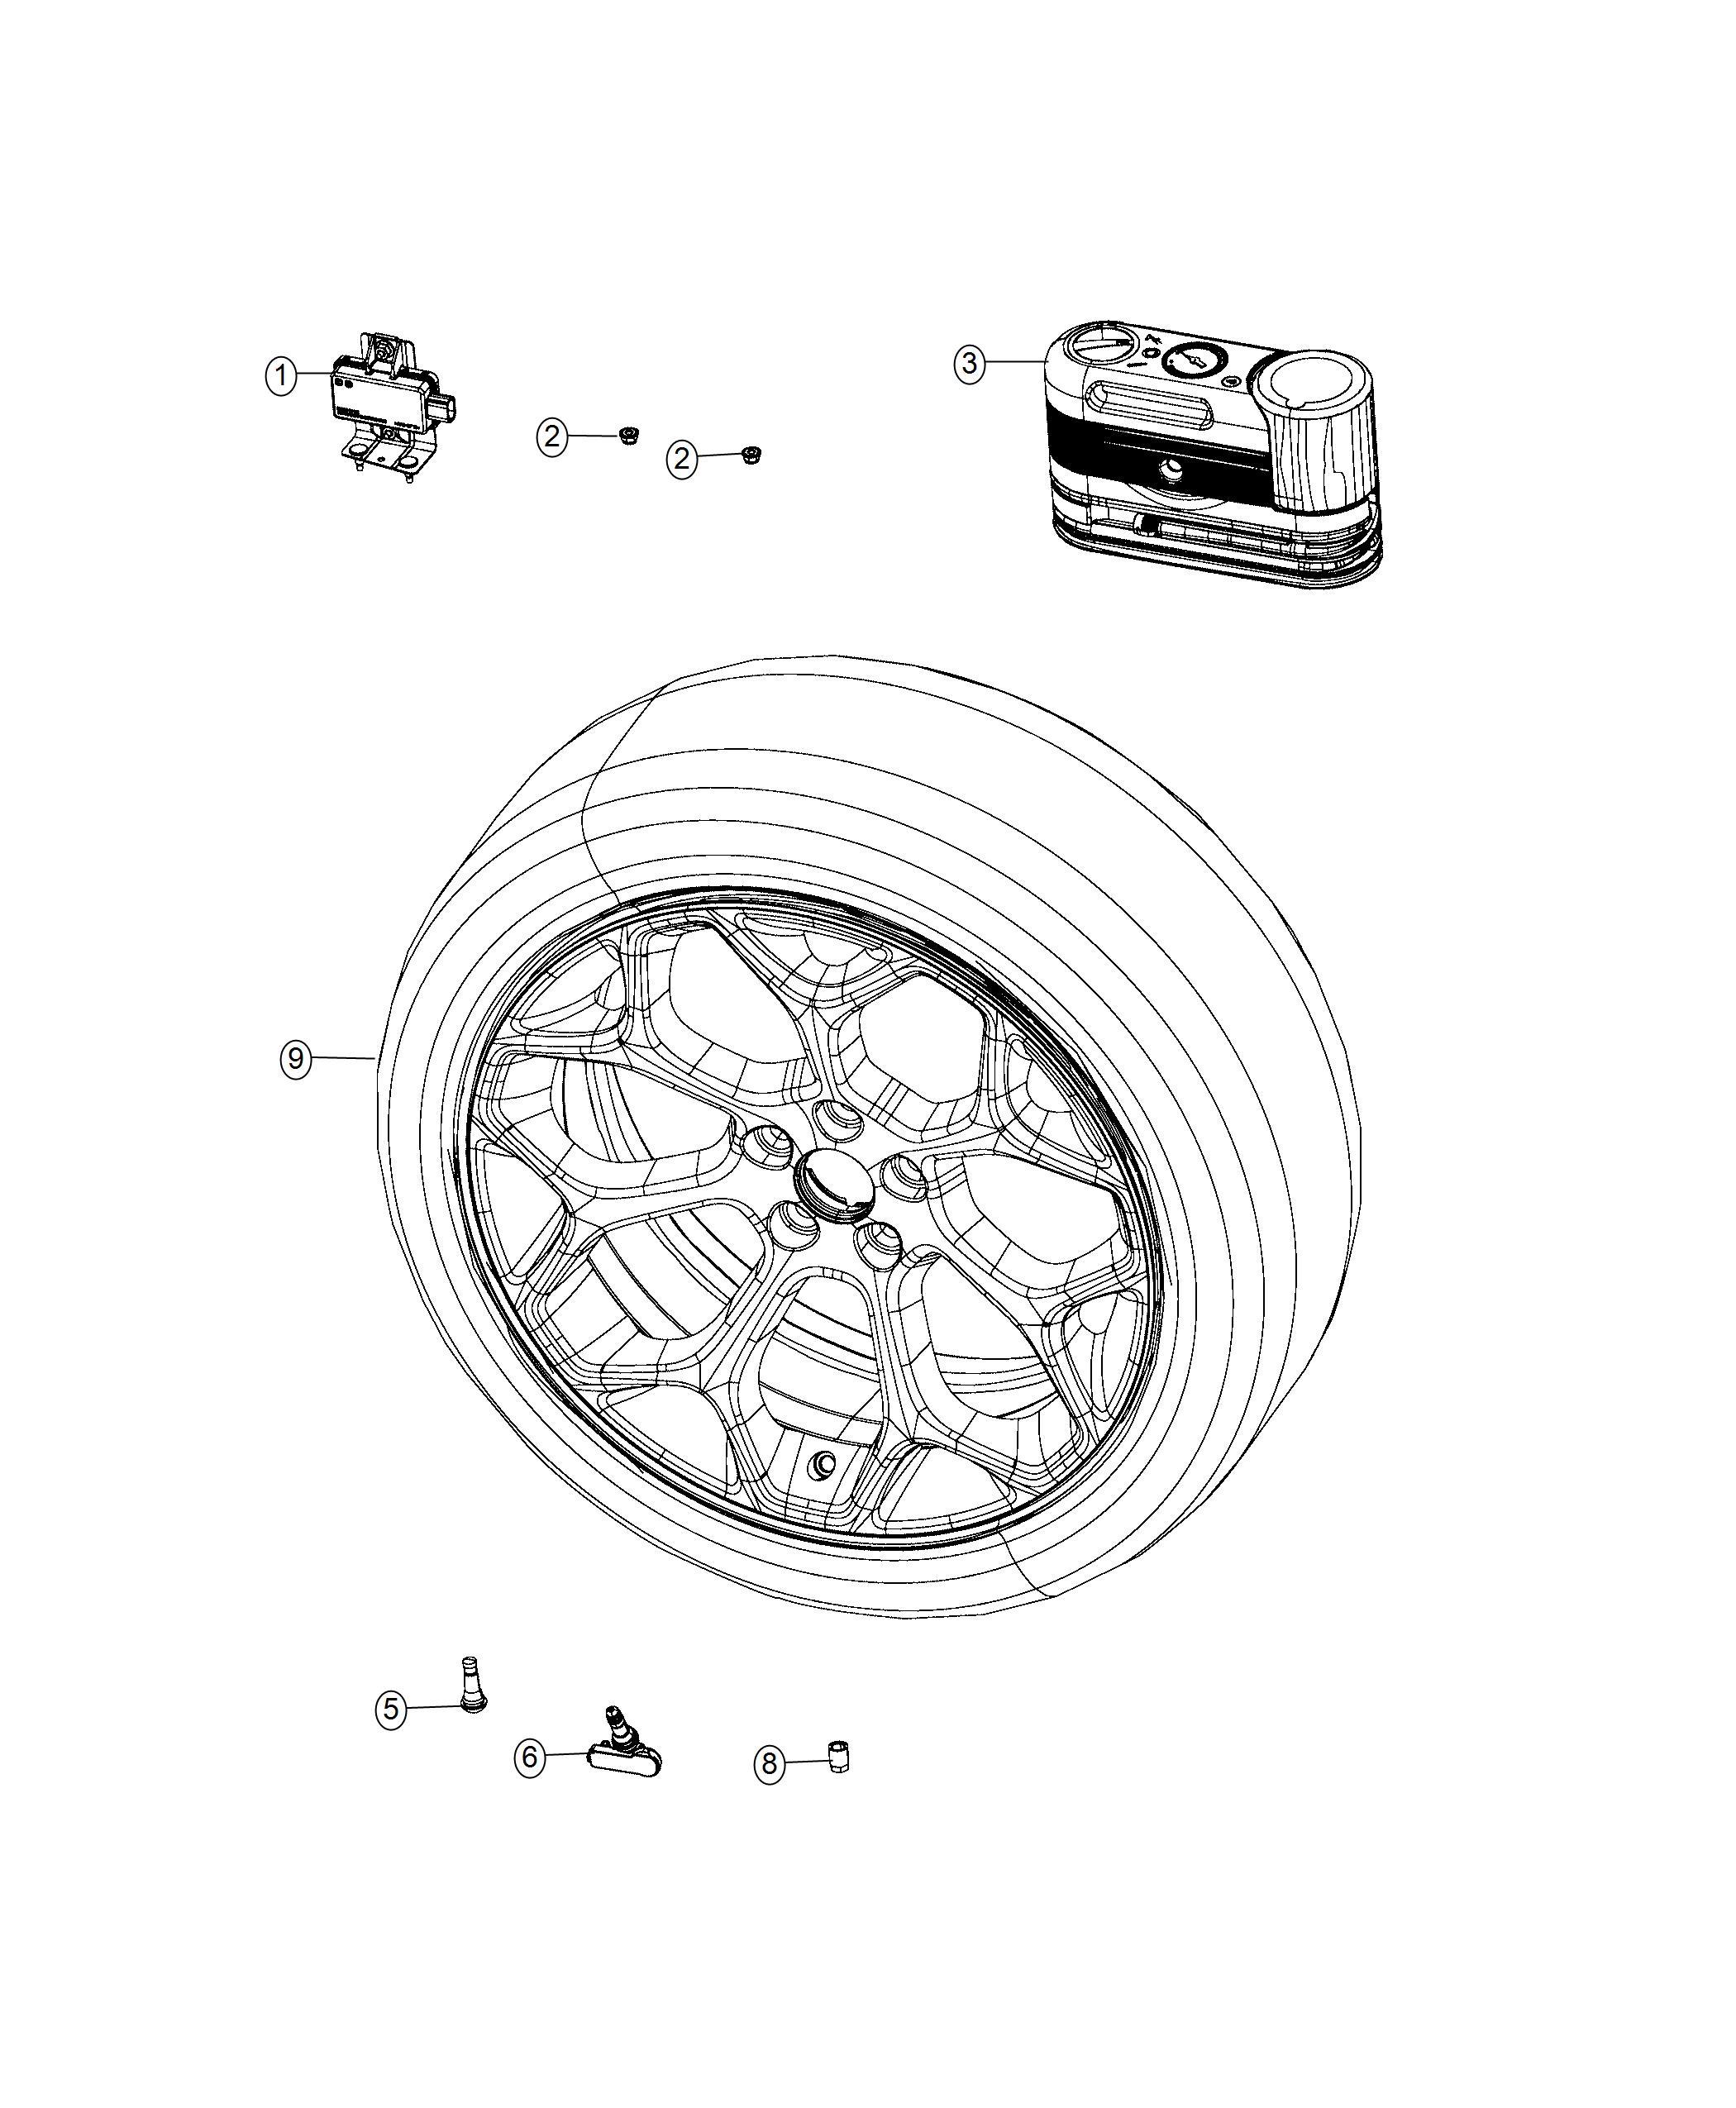 Chrysler 300 Module Tire Pressure Monitoring